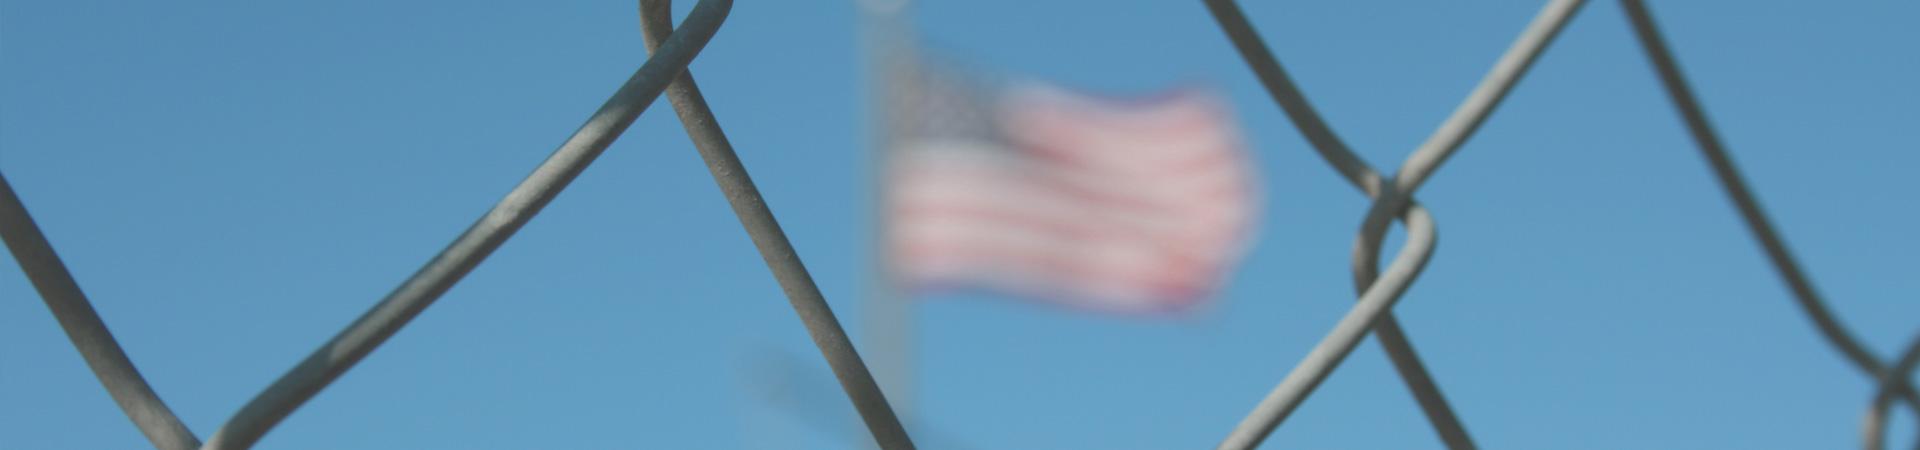 Removal or Deportation Defense Attorney